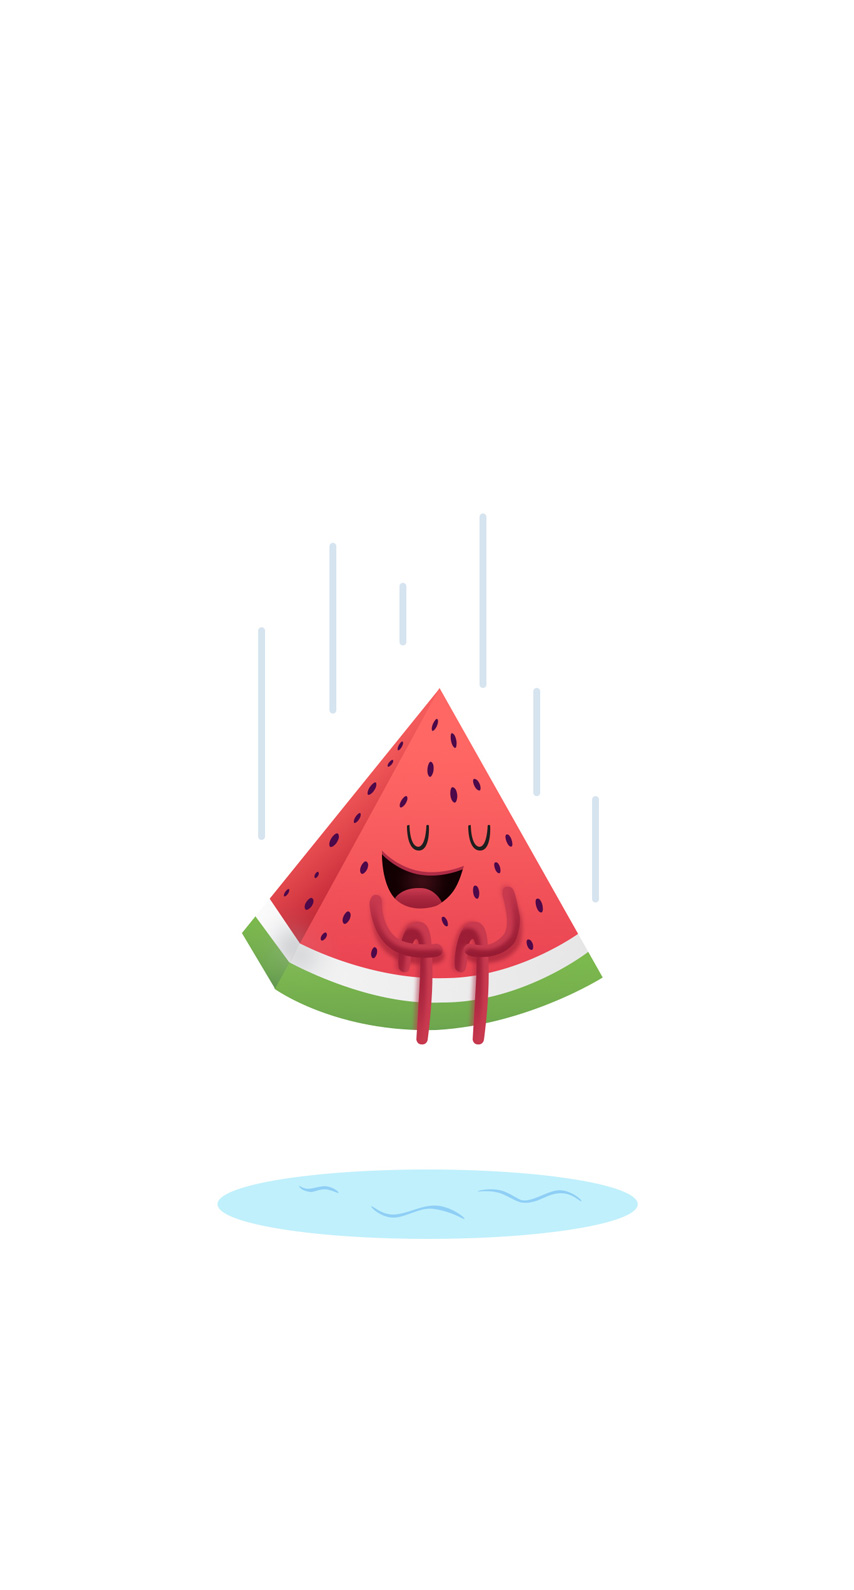 watermelon, jump